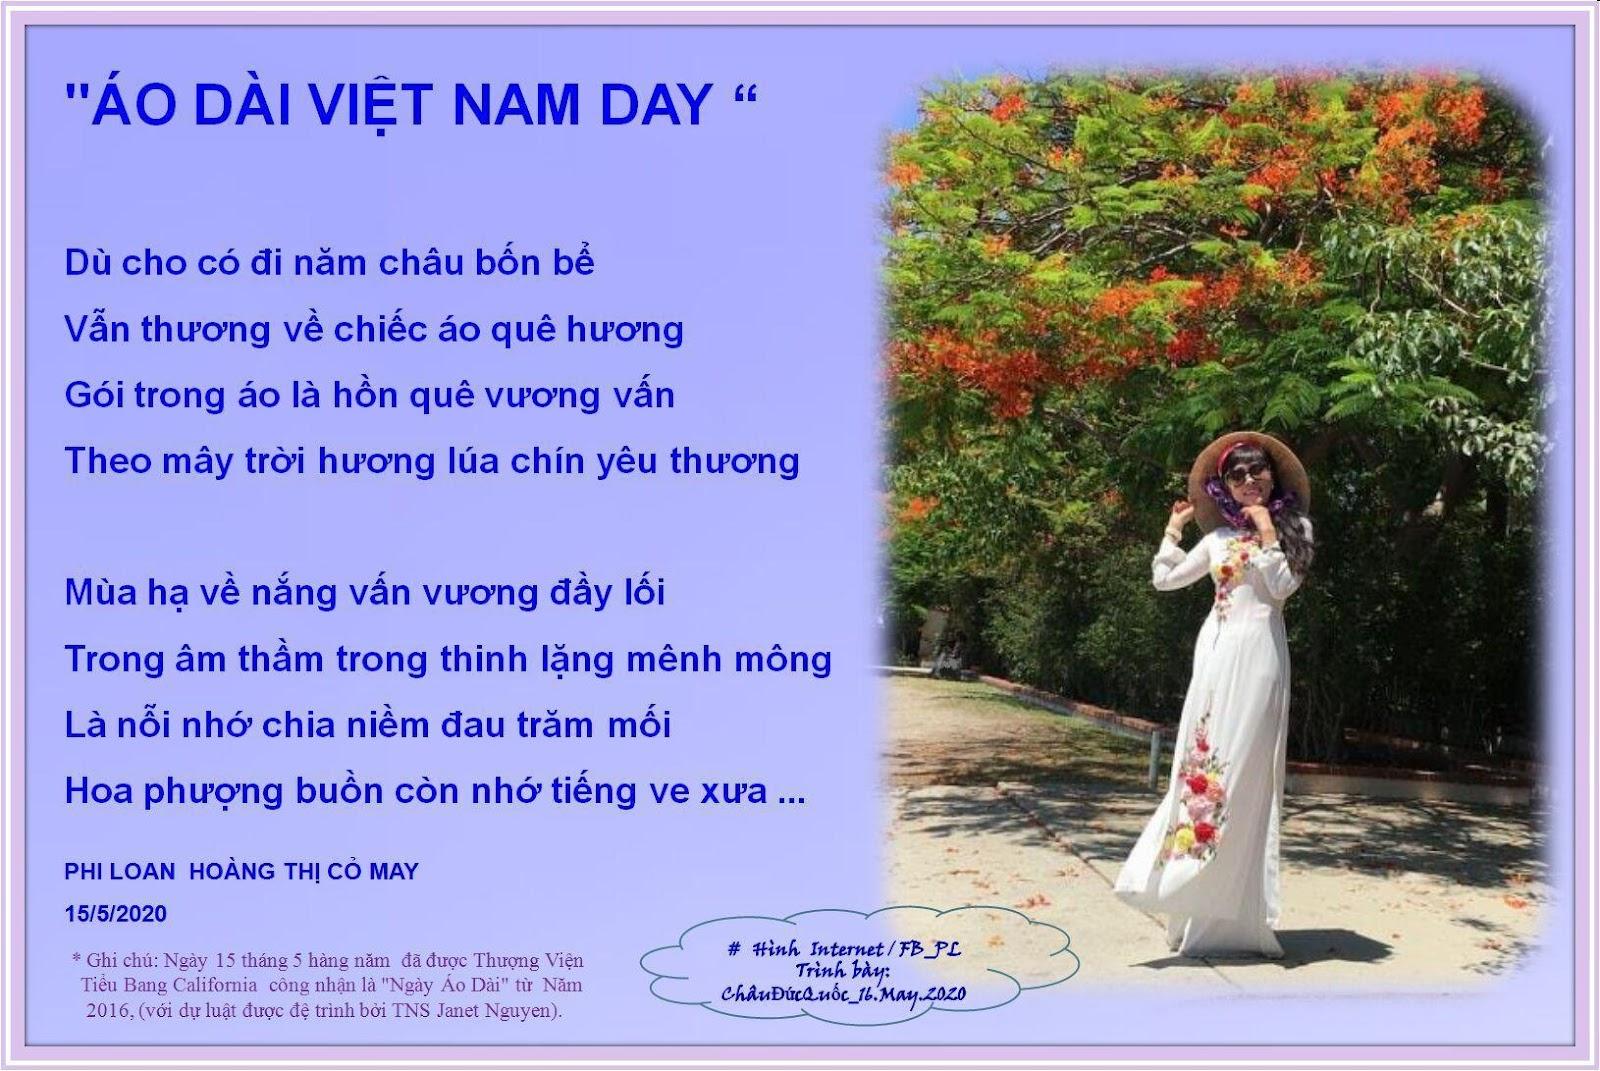 E:\Aktivitäten_Ausland\CauLacBo TinhNgheSi\Pics of PL_HTCM\Ao´Dài VietNam Day (15.5_PL)-1.jpg